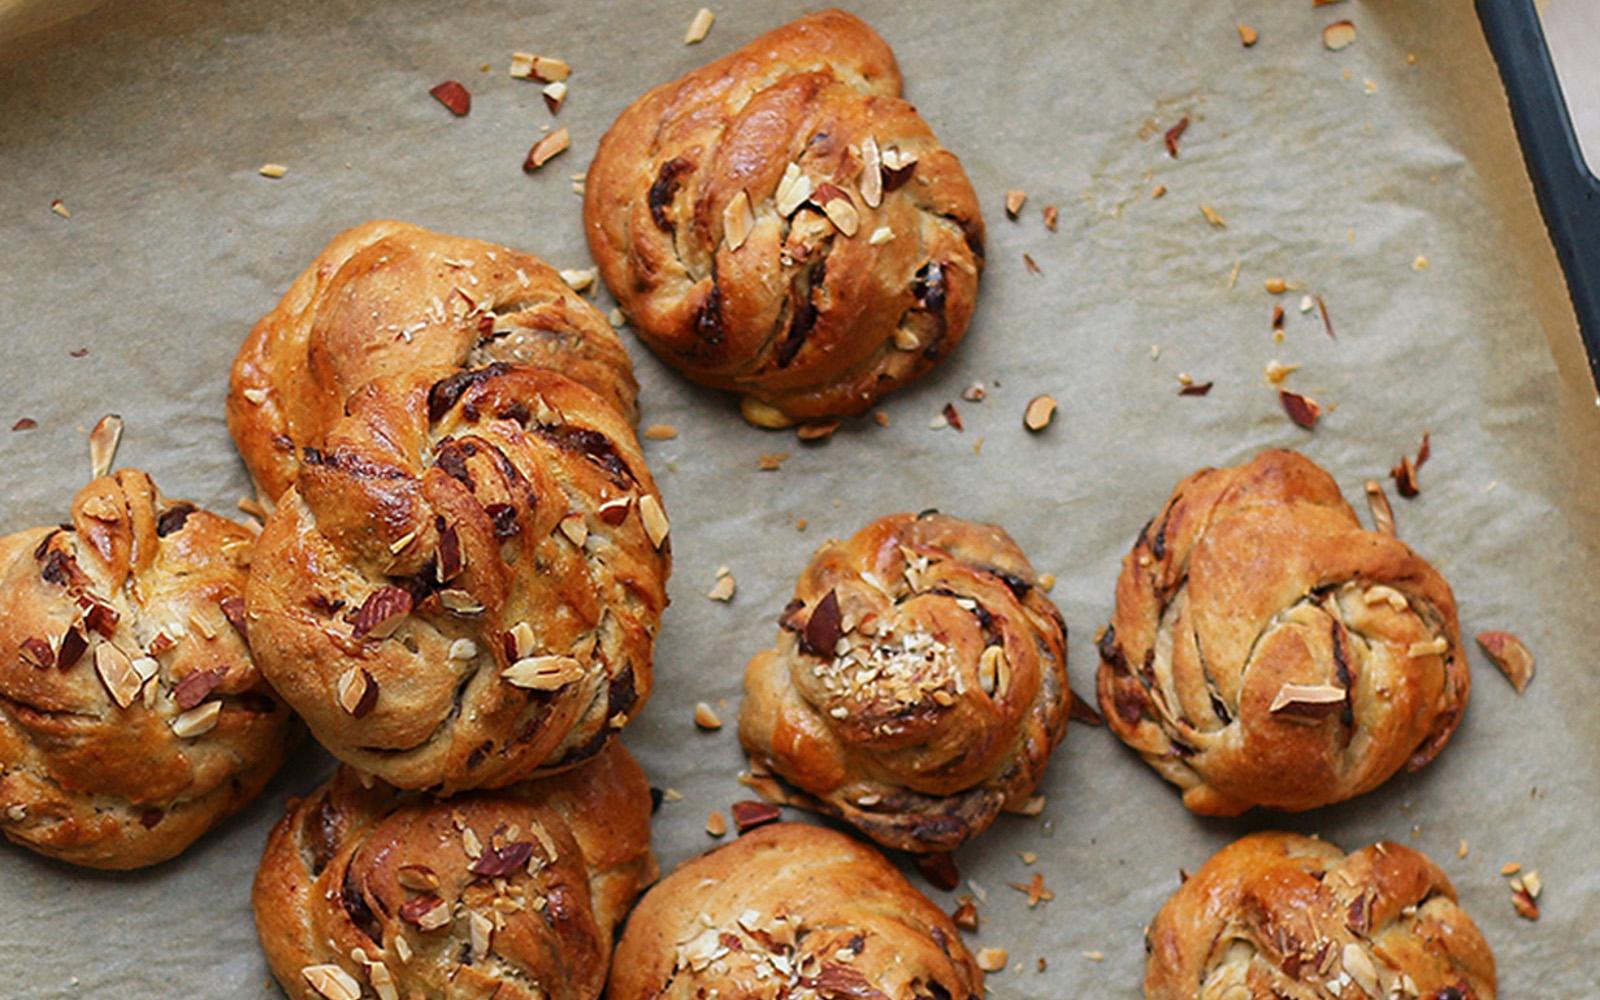 Sourdough Cinnamon Buns With Dates b